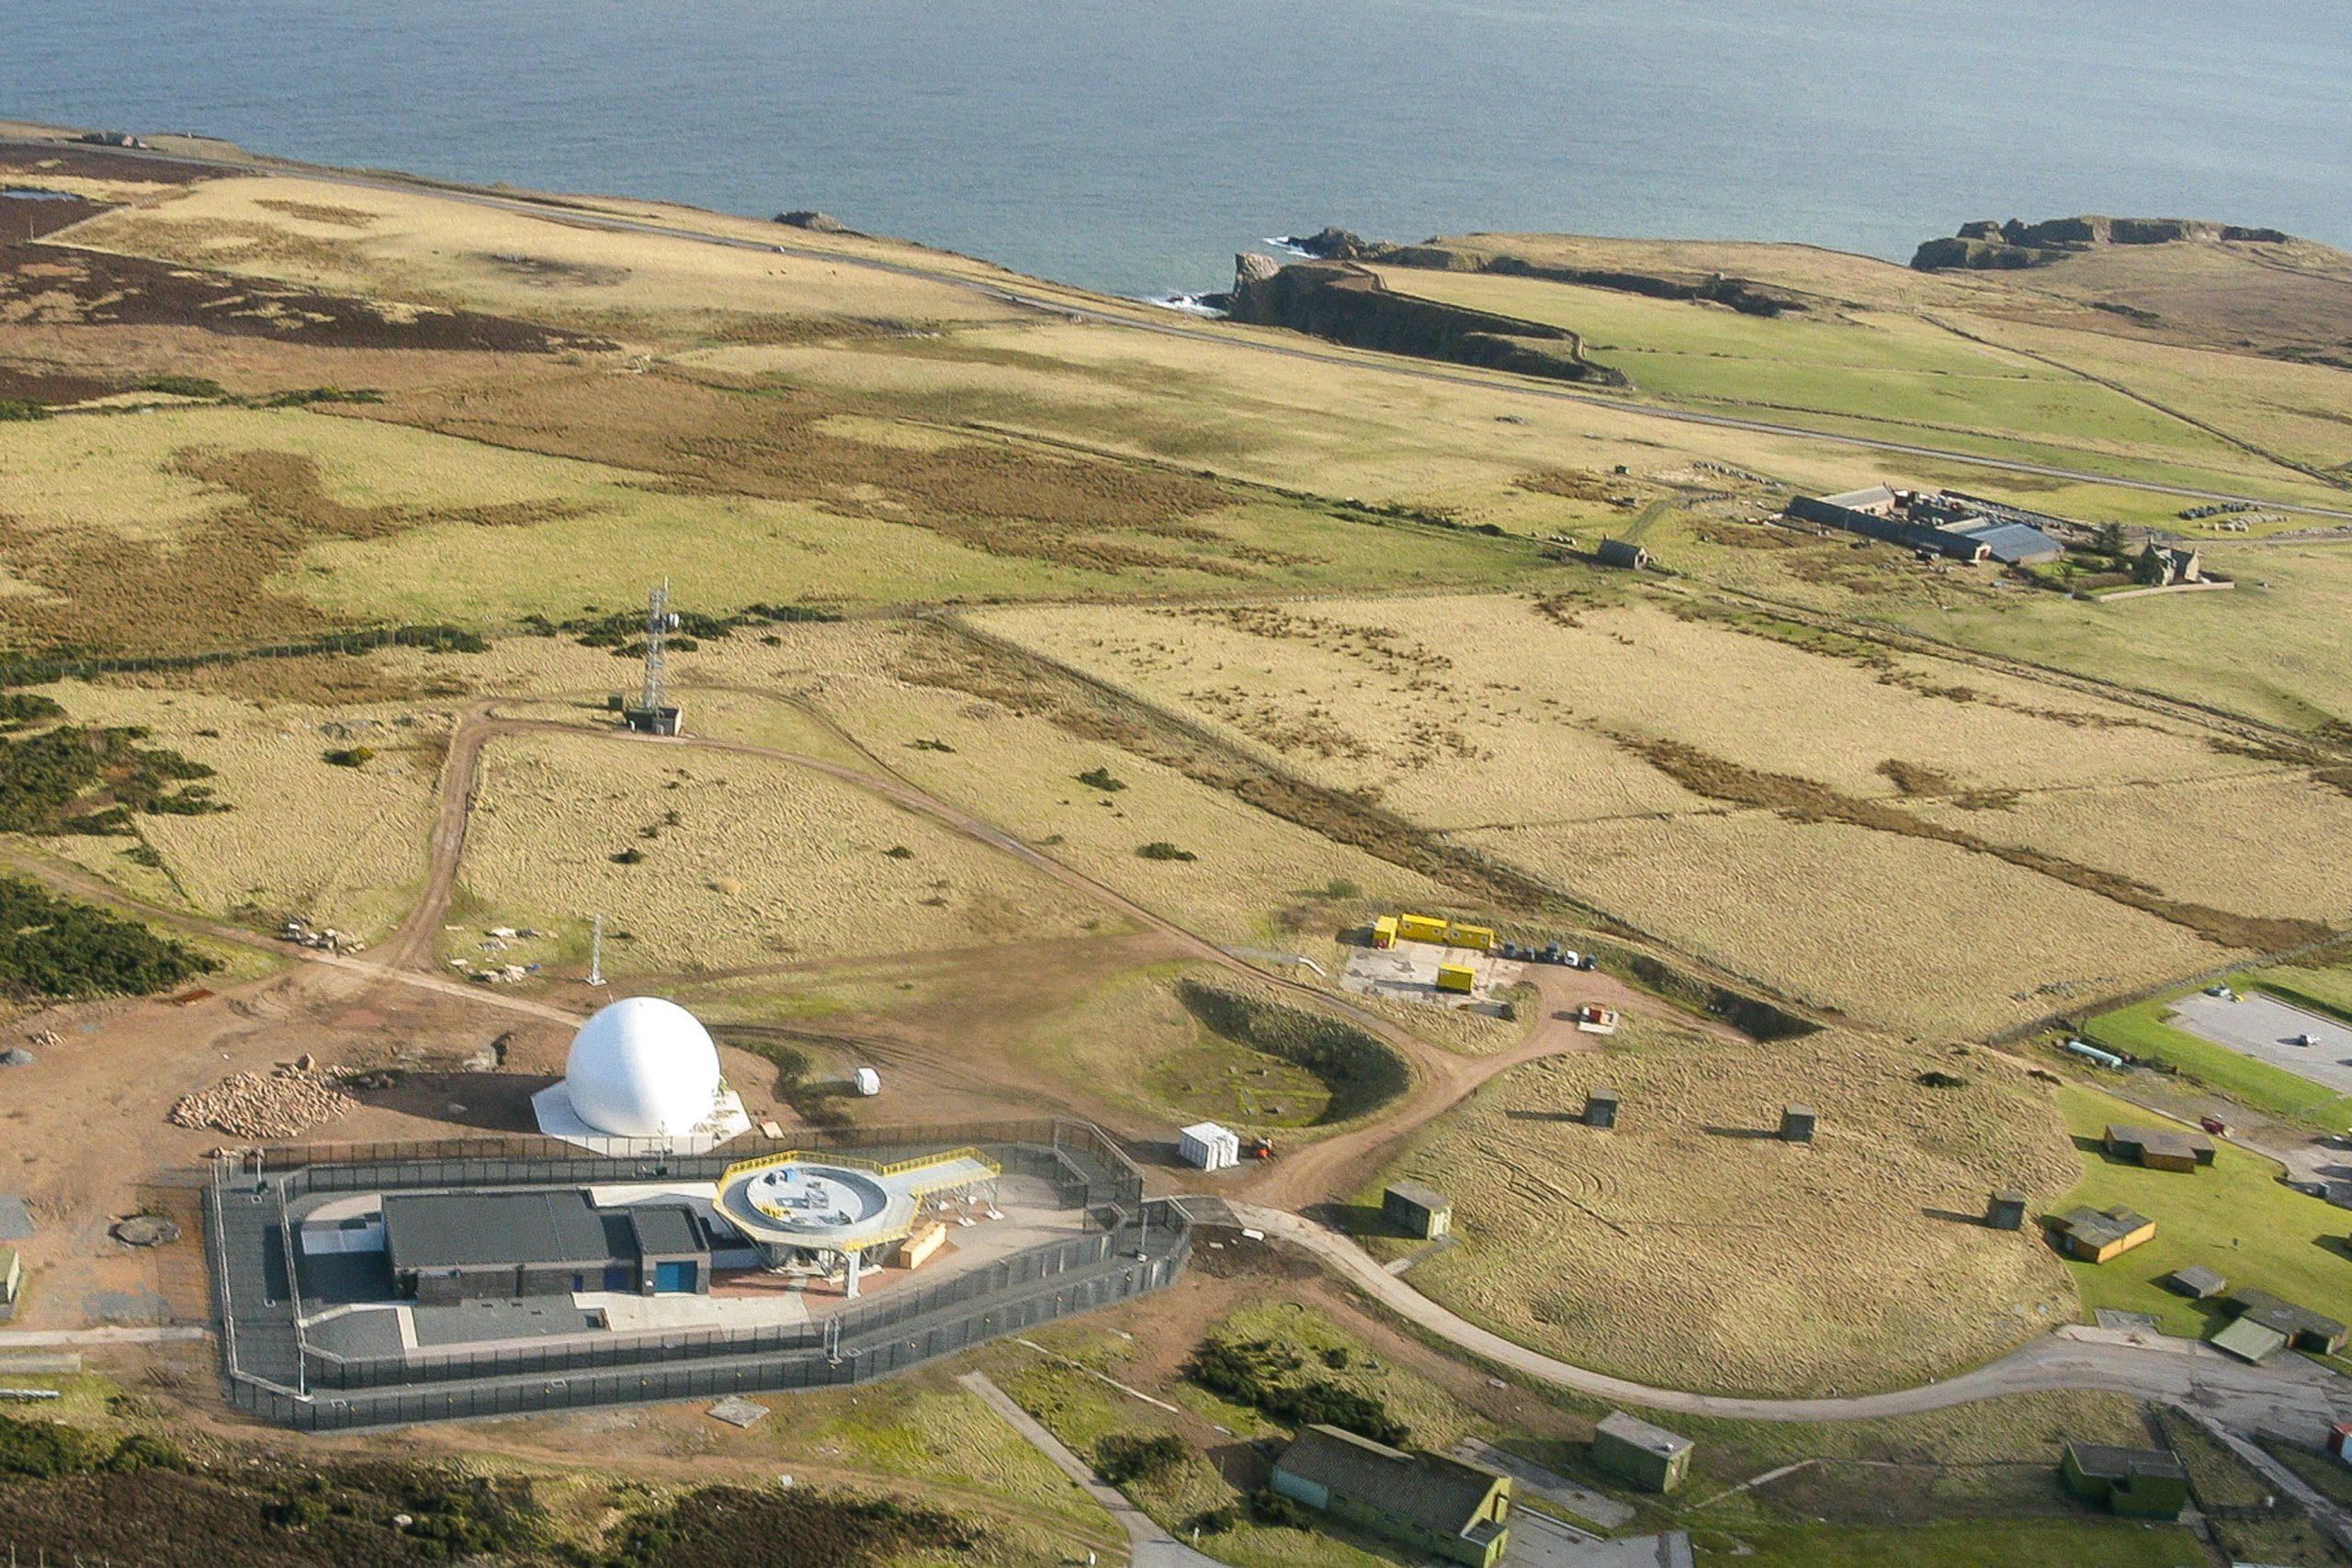 Installation of two radar towers - RRH Buchan and RRH Brizlee Wood